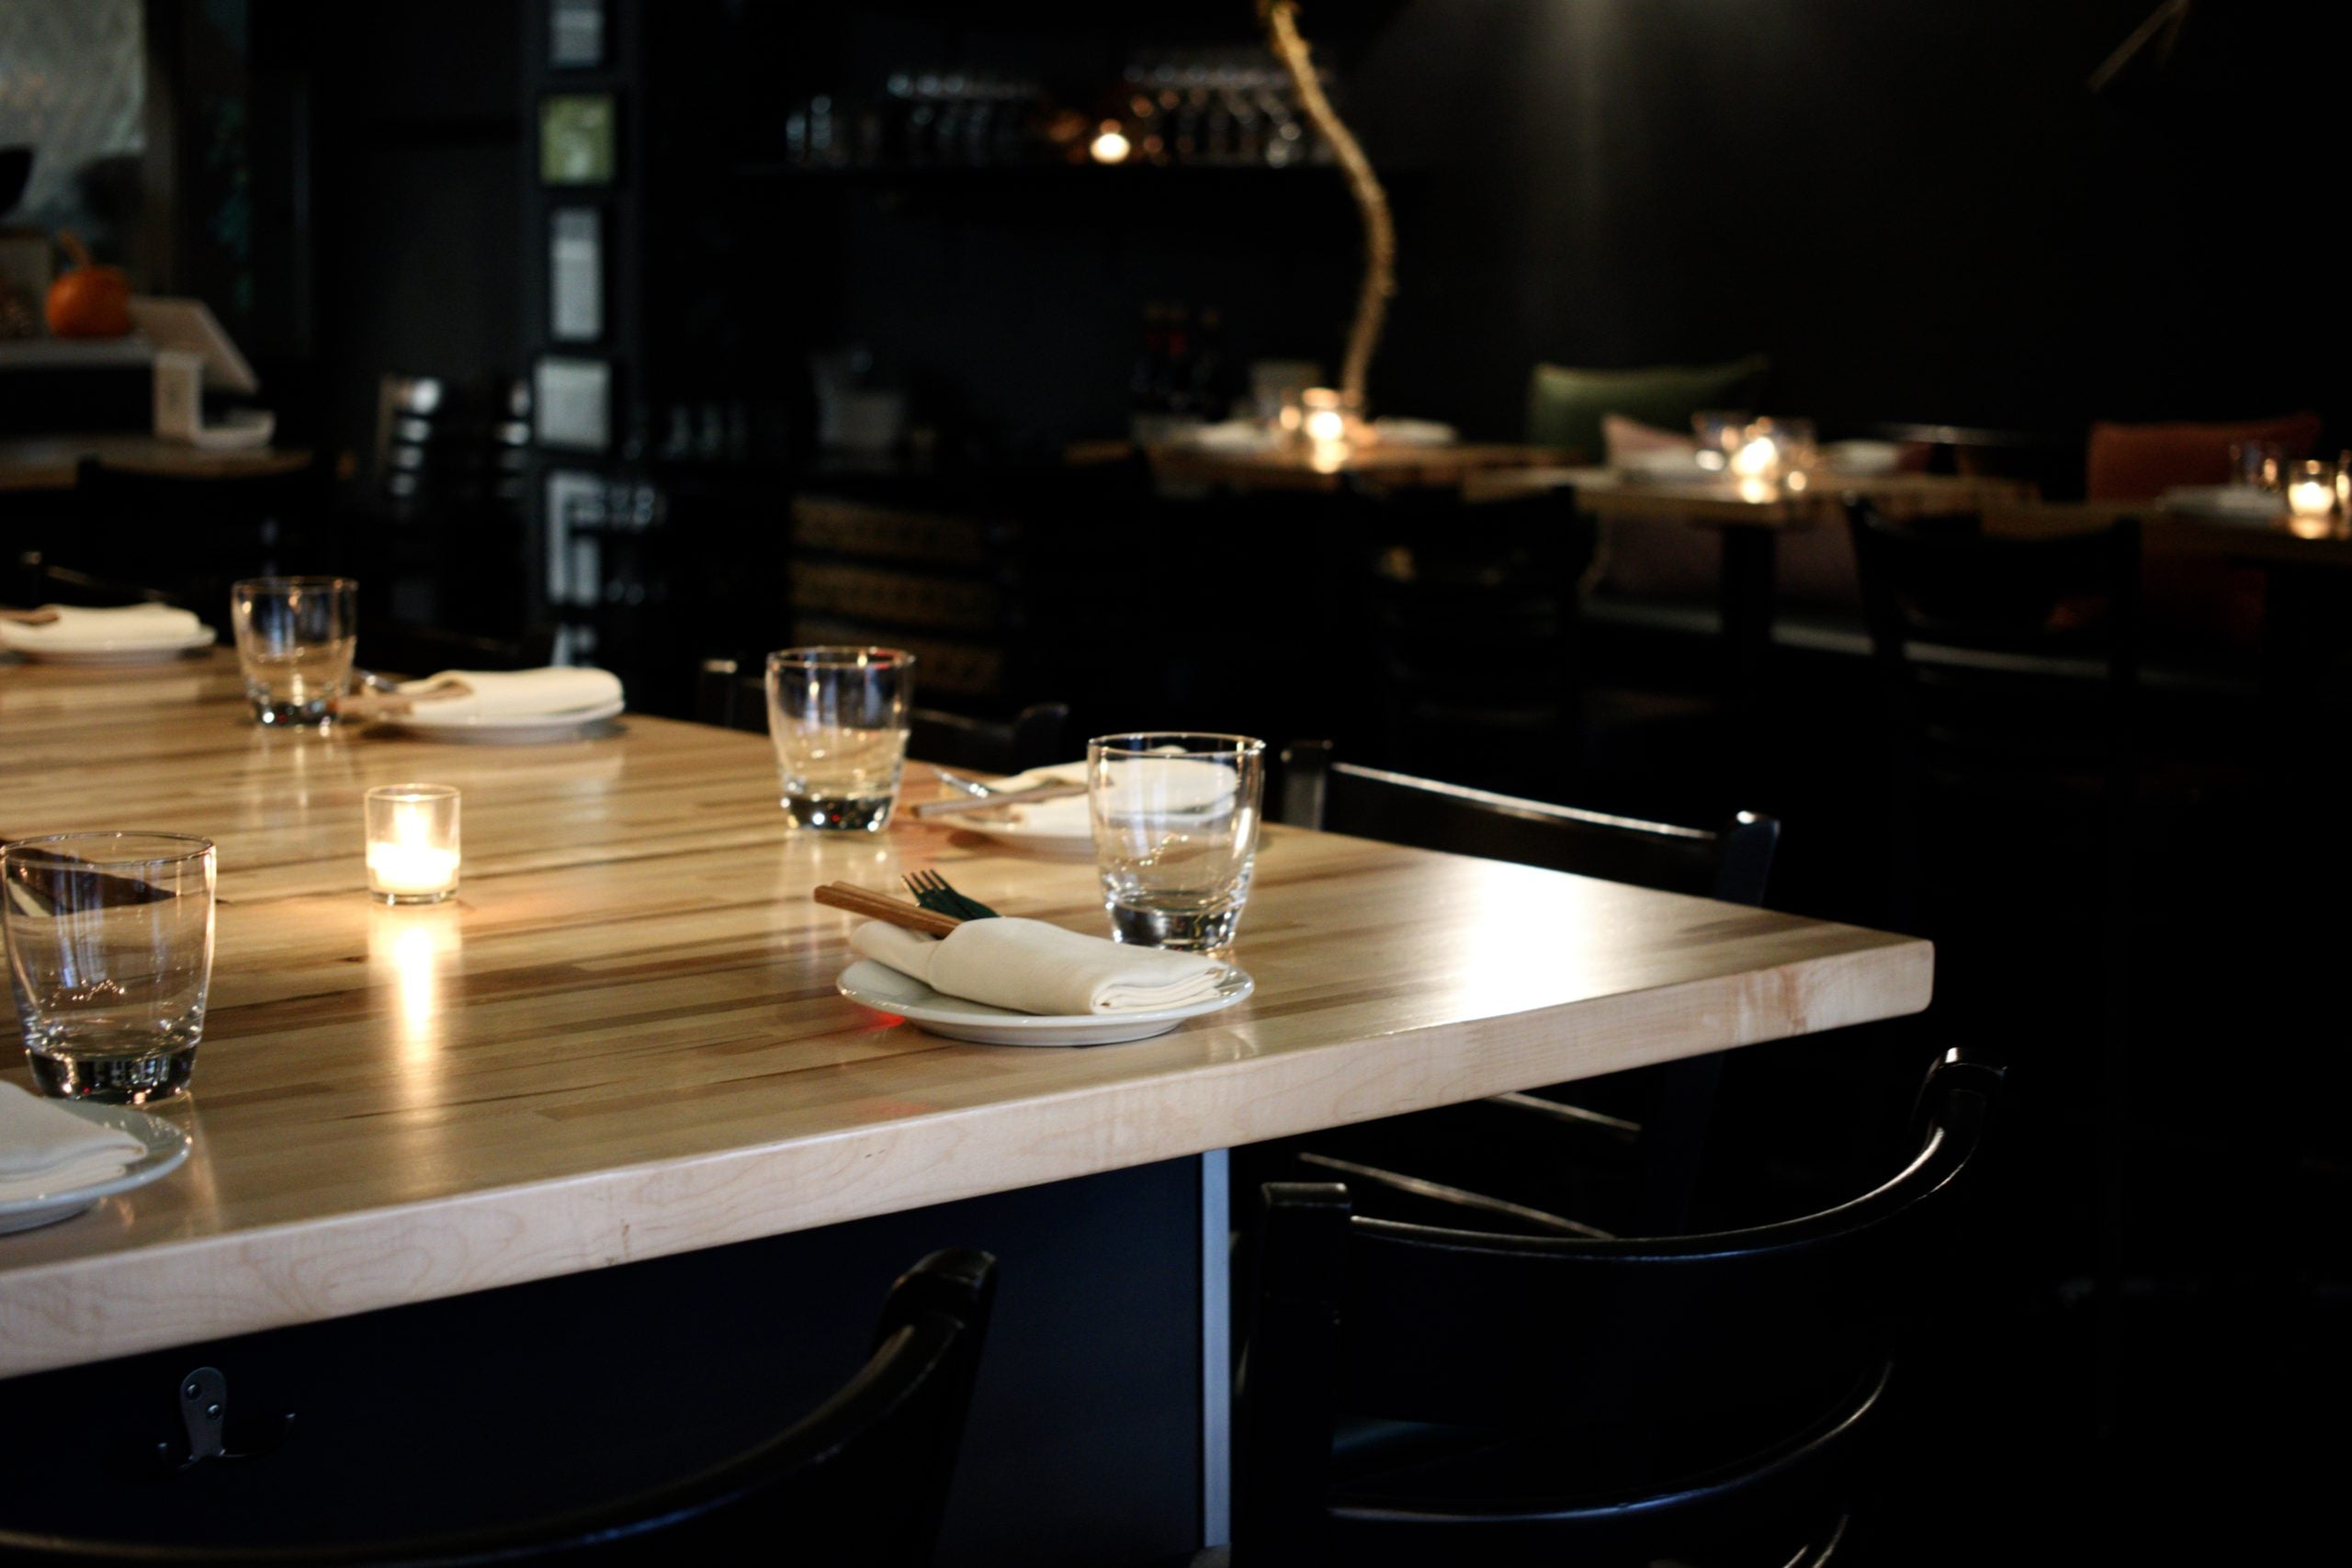 Table setting at Nightshade Noodle Bar